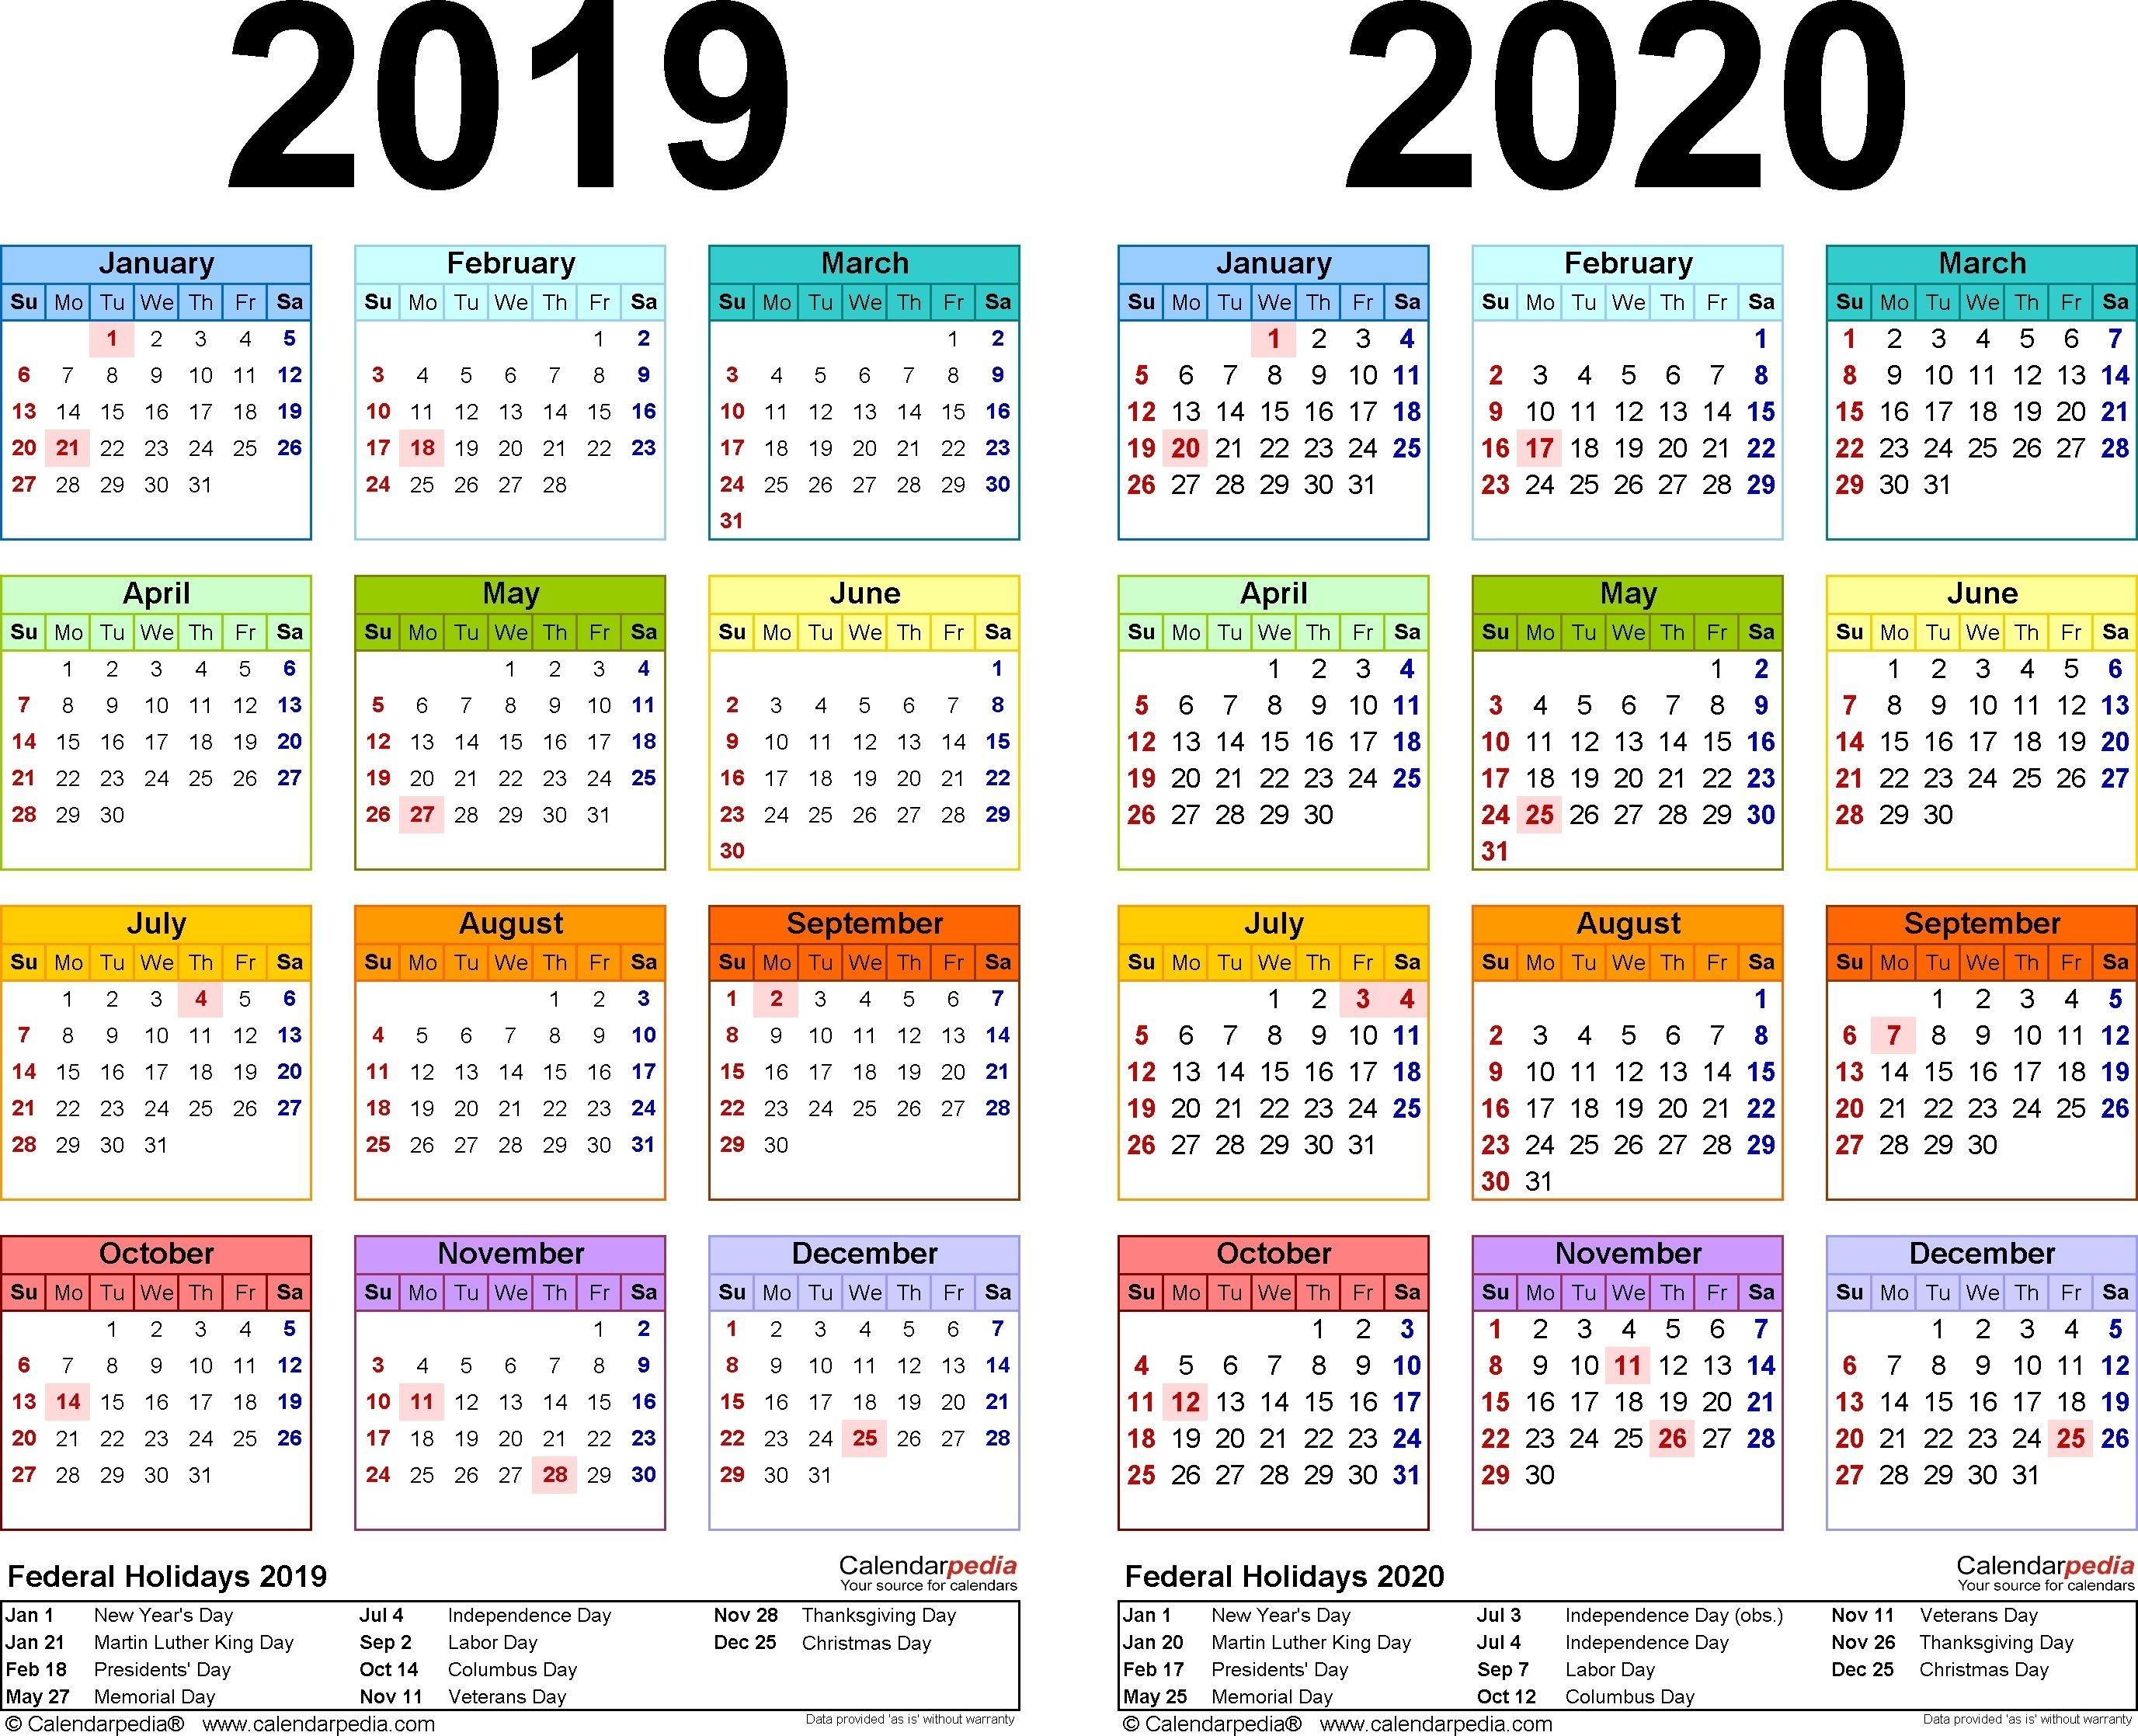 2019-2020 Calendar - Free Printable Two-Year Pdf Calendars-2020 Calendar Template For Illustrator